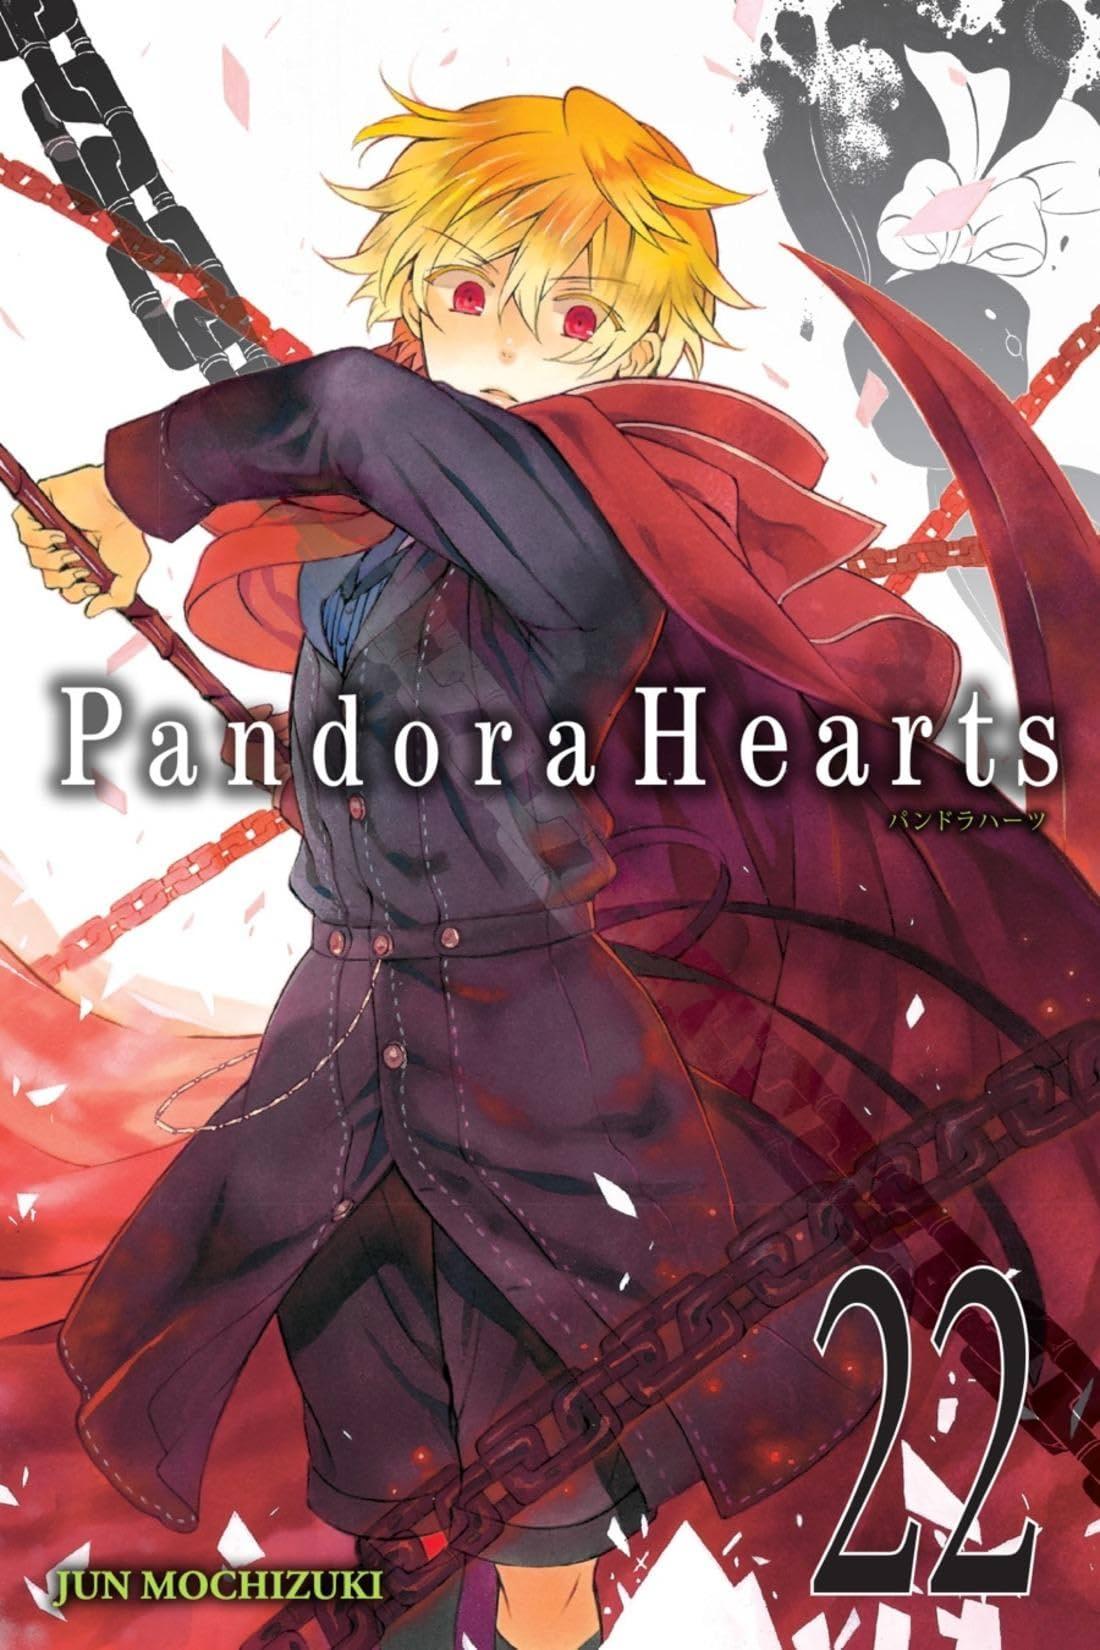 PandoraHearts Vol. 22